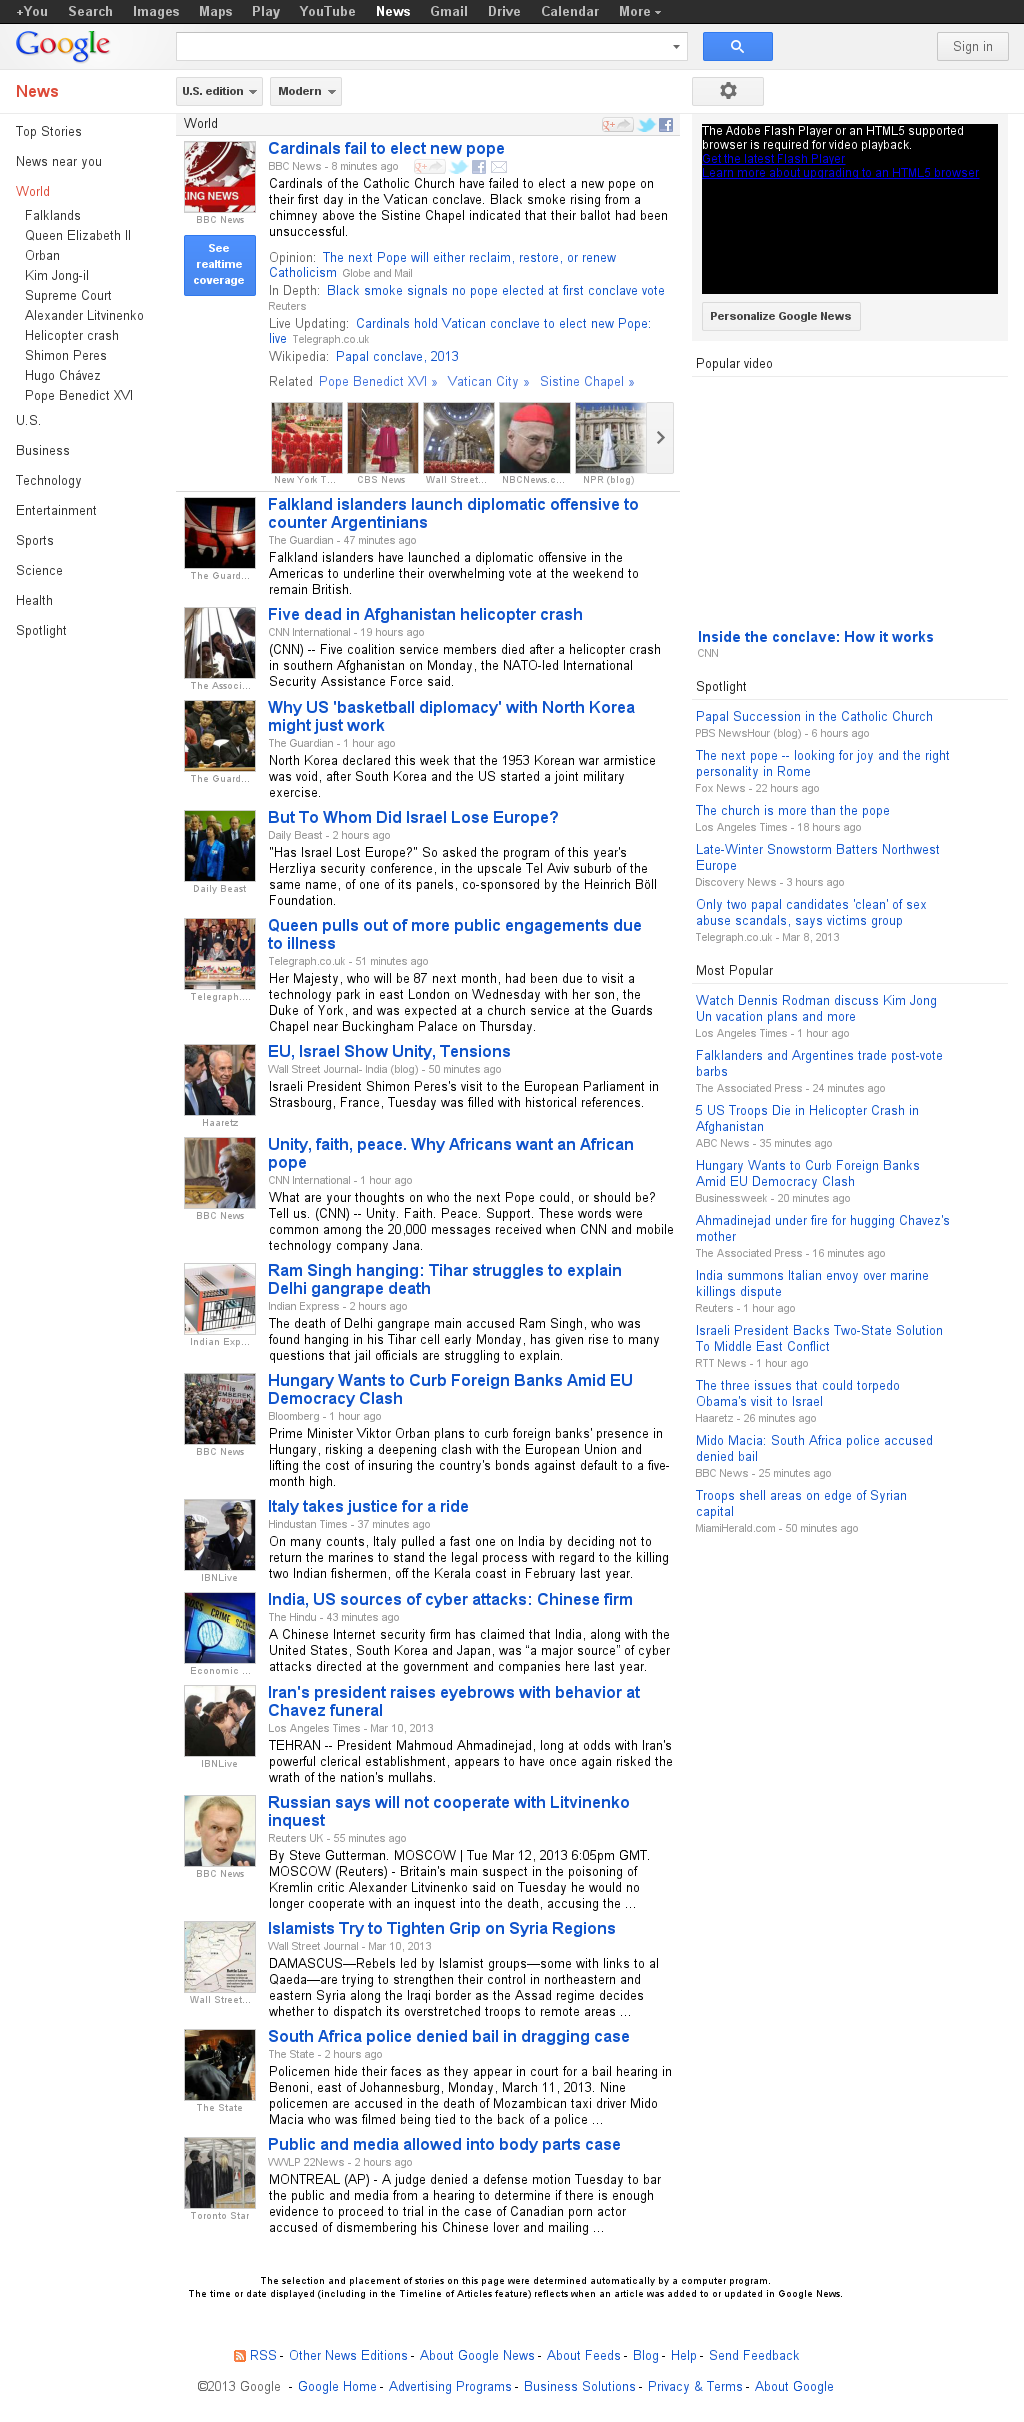 Google News: World at Tuesday March 12, 2013, 7:08 p.m. UTC